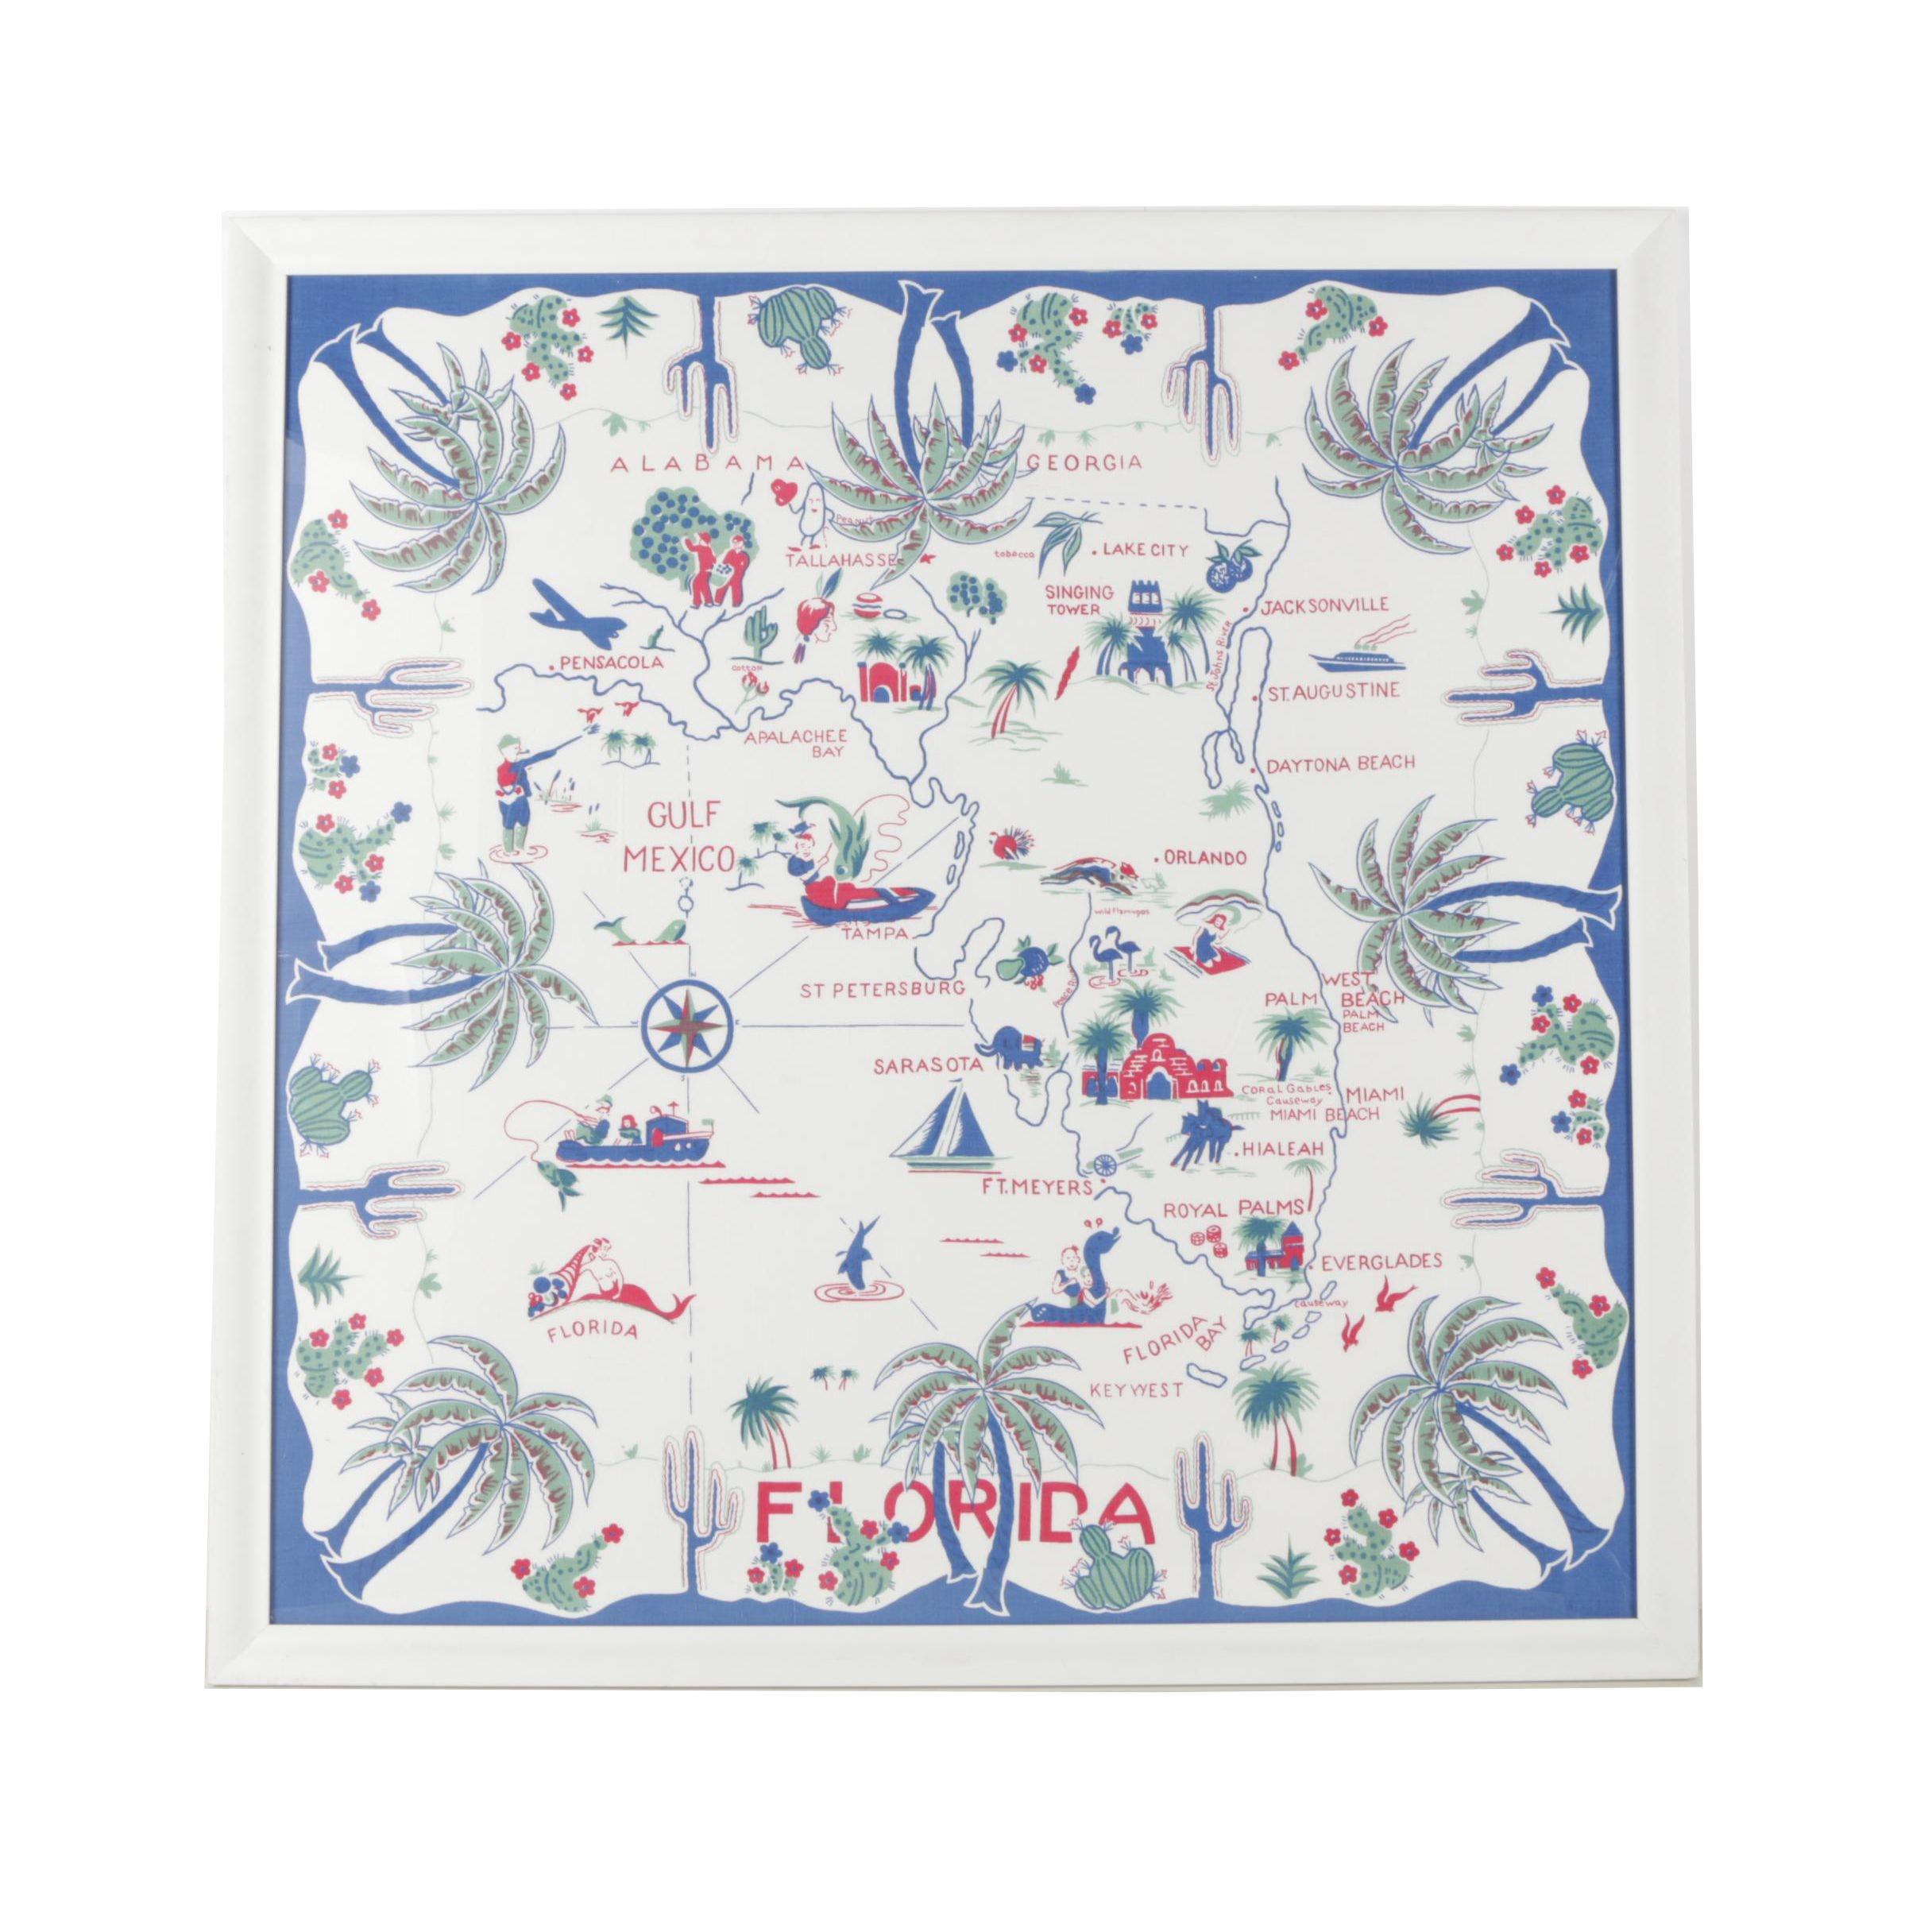 Framed Vintage Cotton Printed Tablecloth of Florida